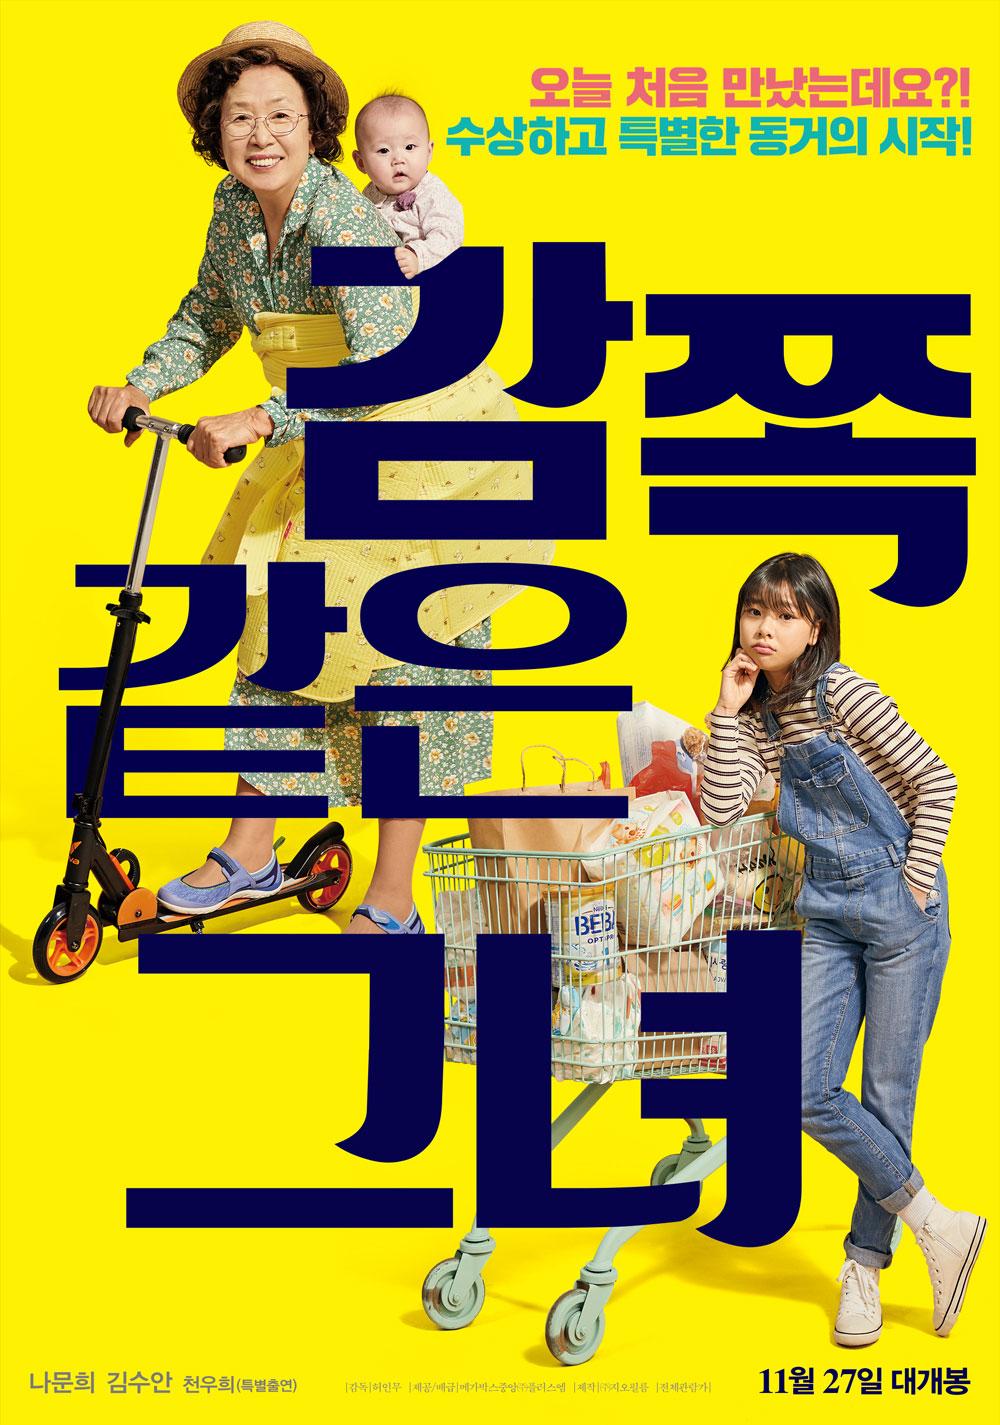 Sinopsis Film Korea: A Little Princess (2019)